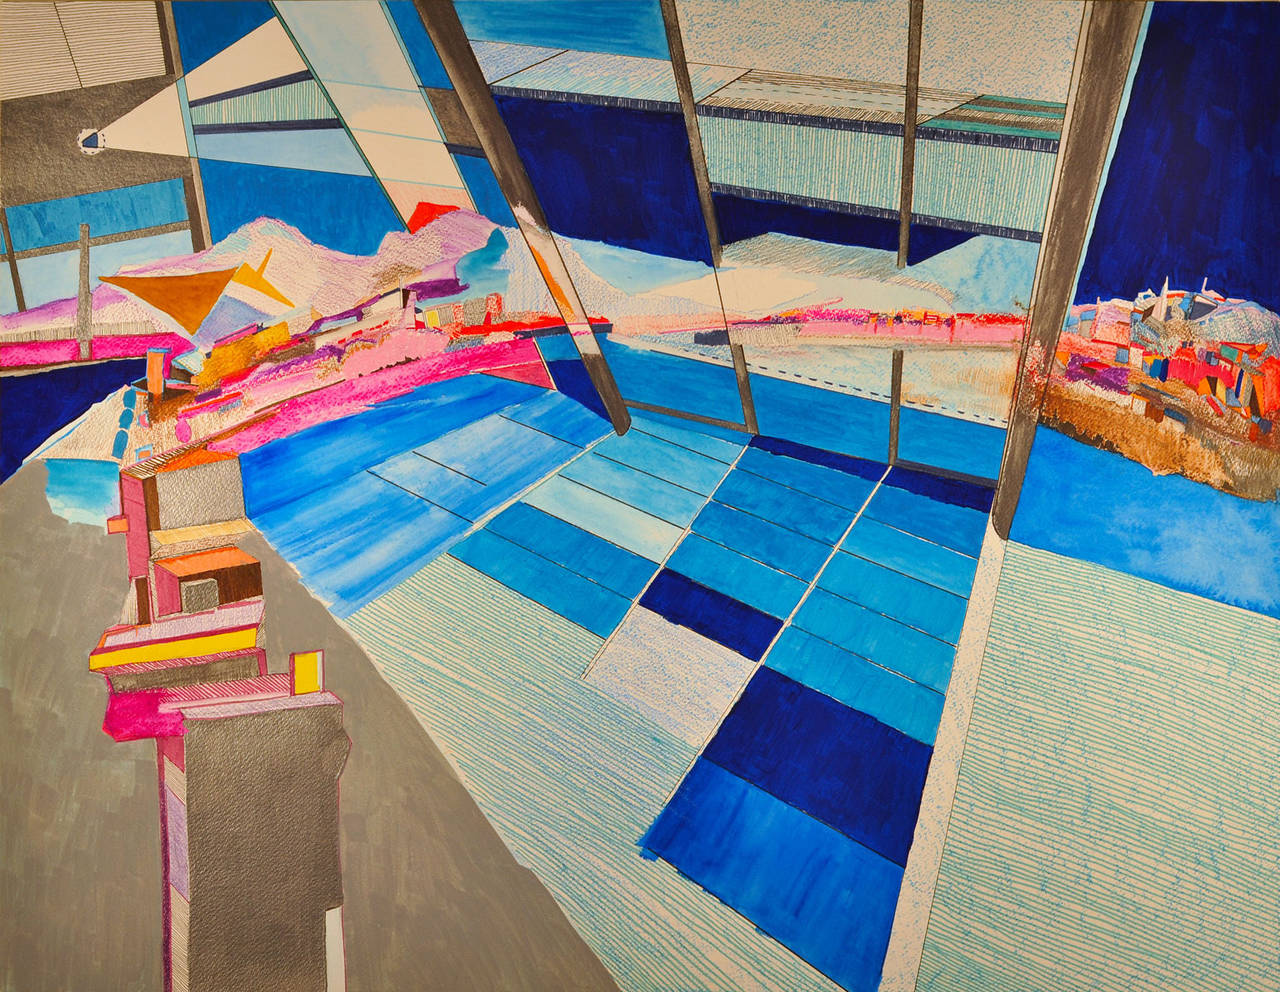 Yasemin Kackar Demirel Landscape Art - Into The Blue Yonder